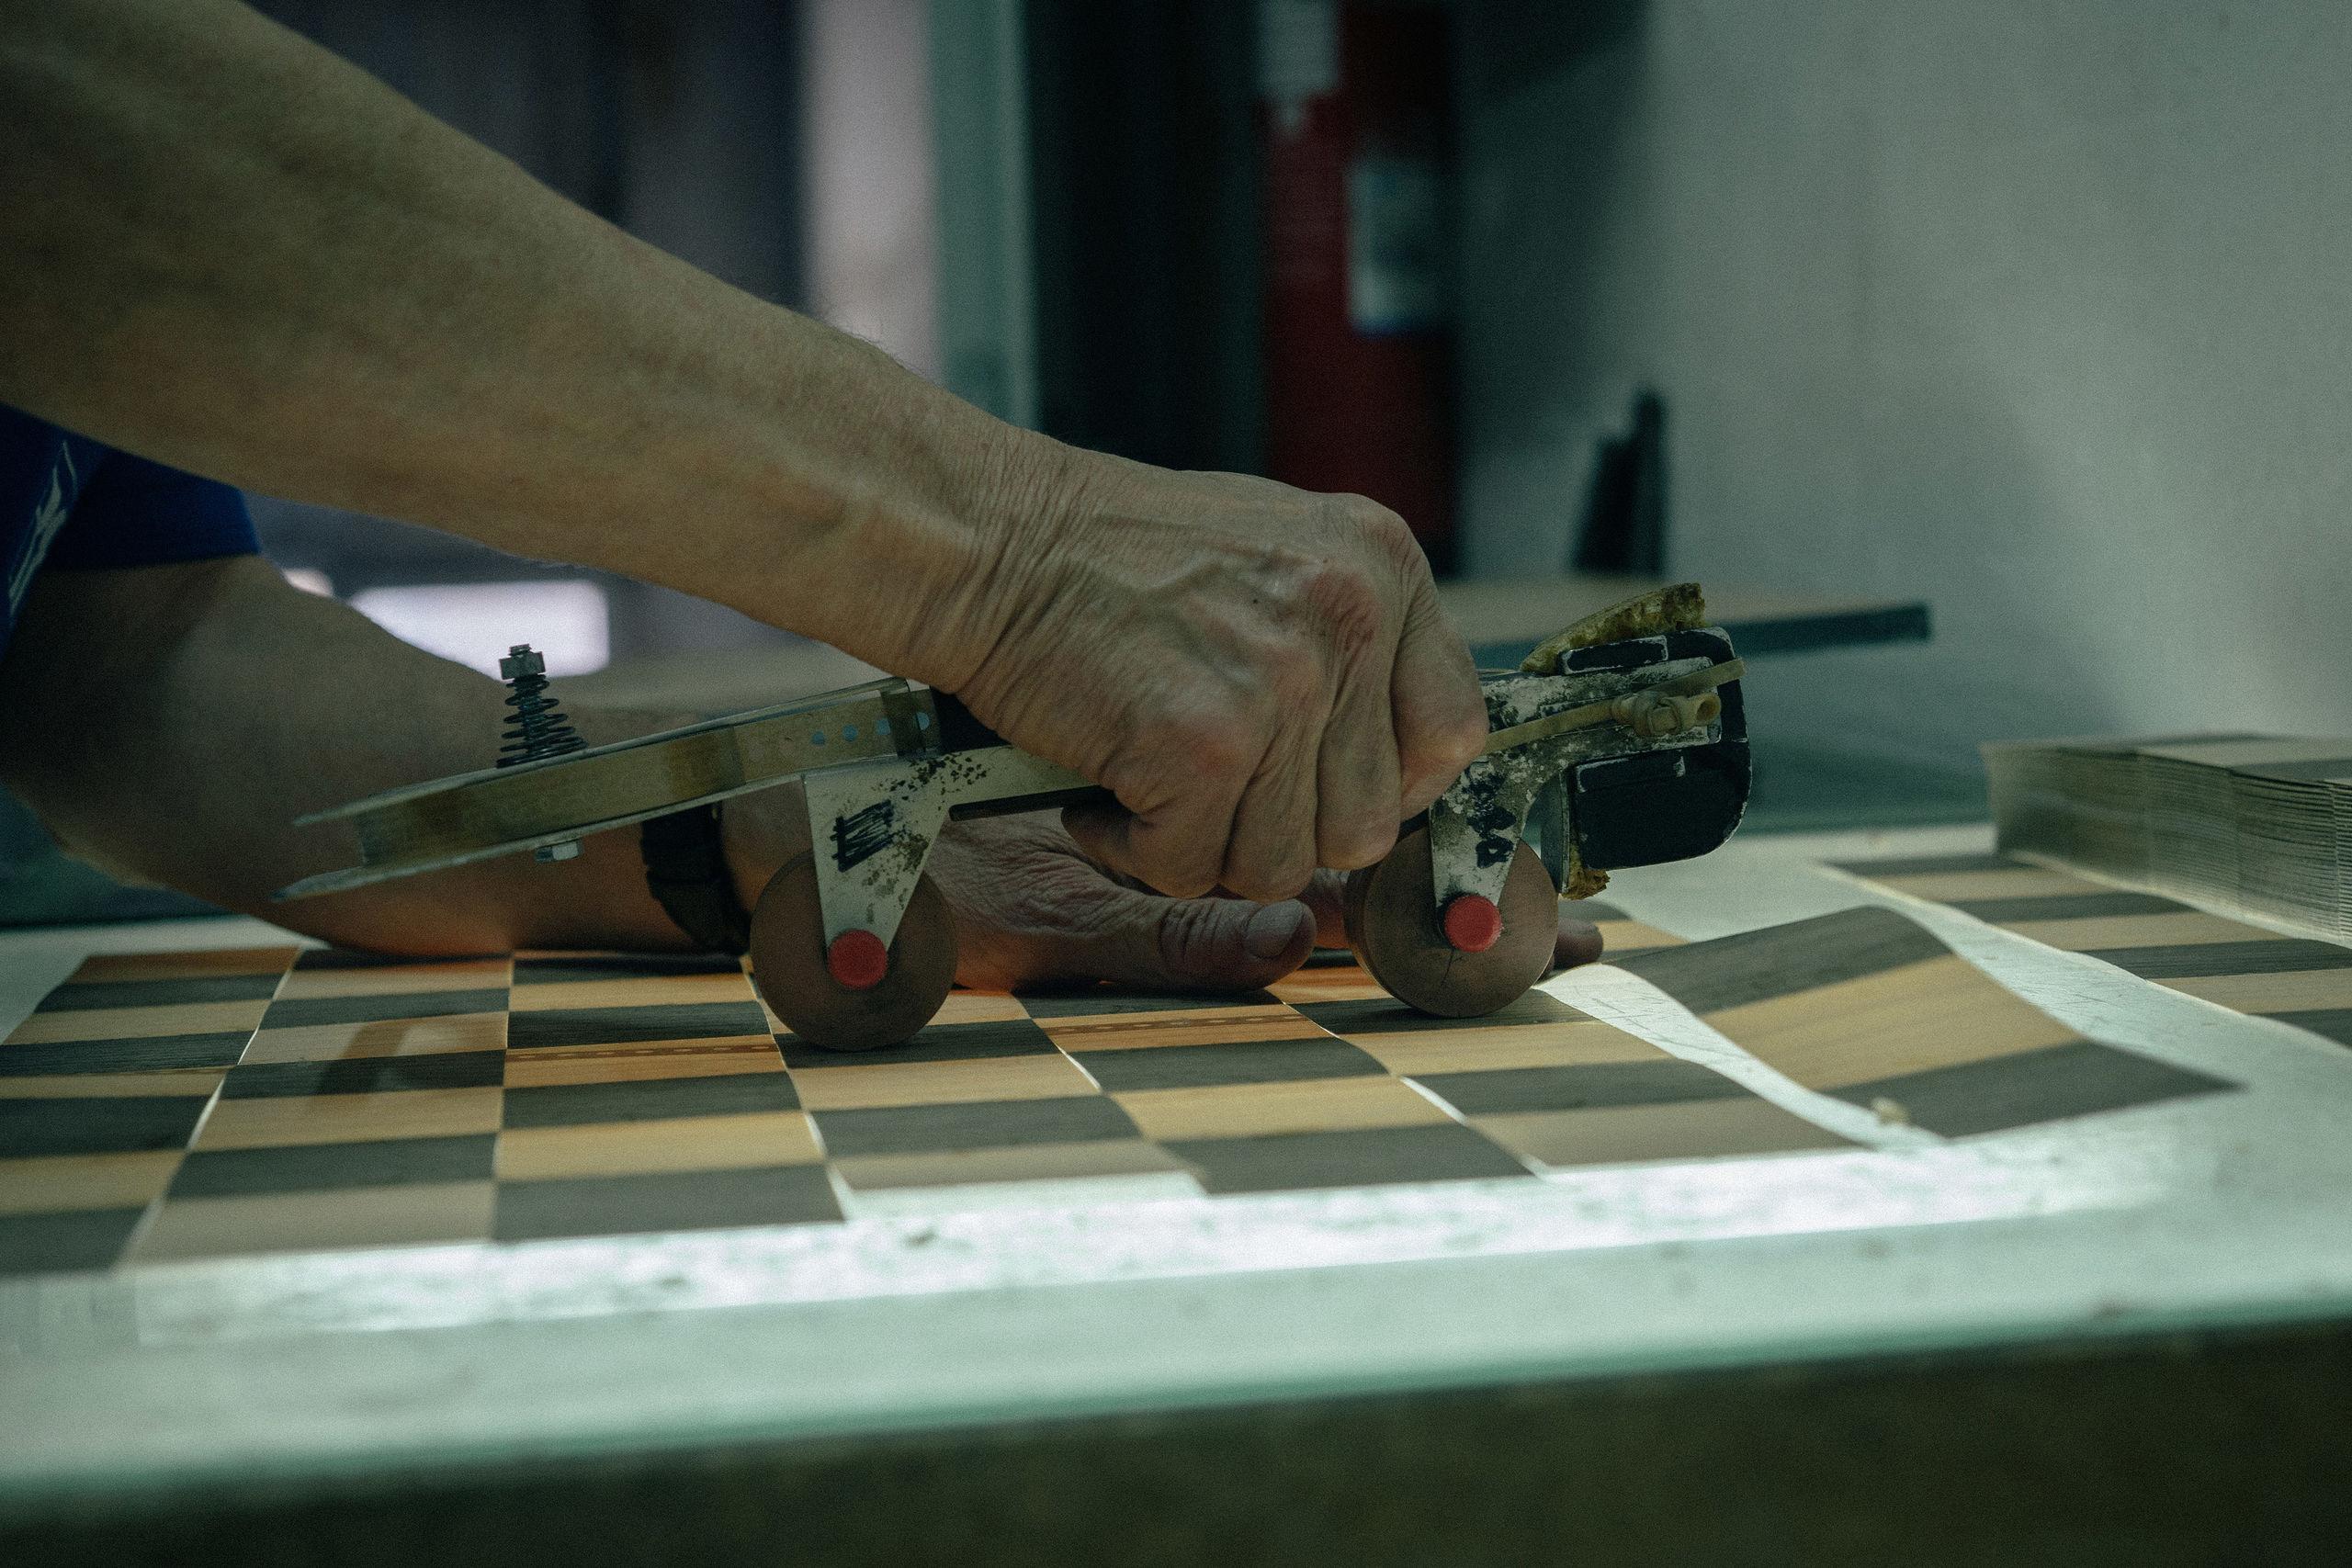 fabrica-tablero-ajedrez-rechapados-ferrer.jpg